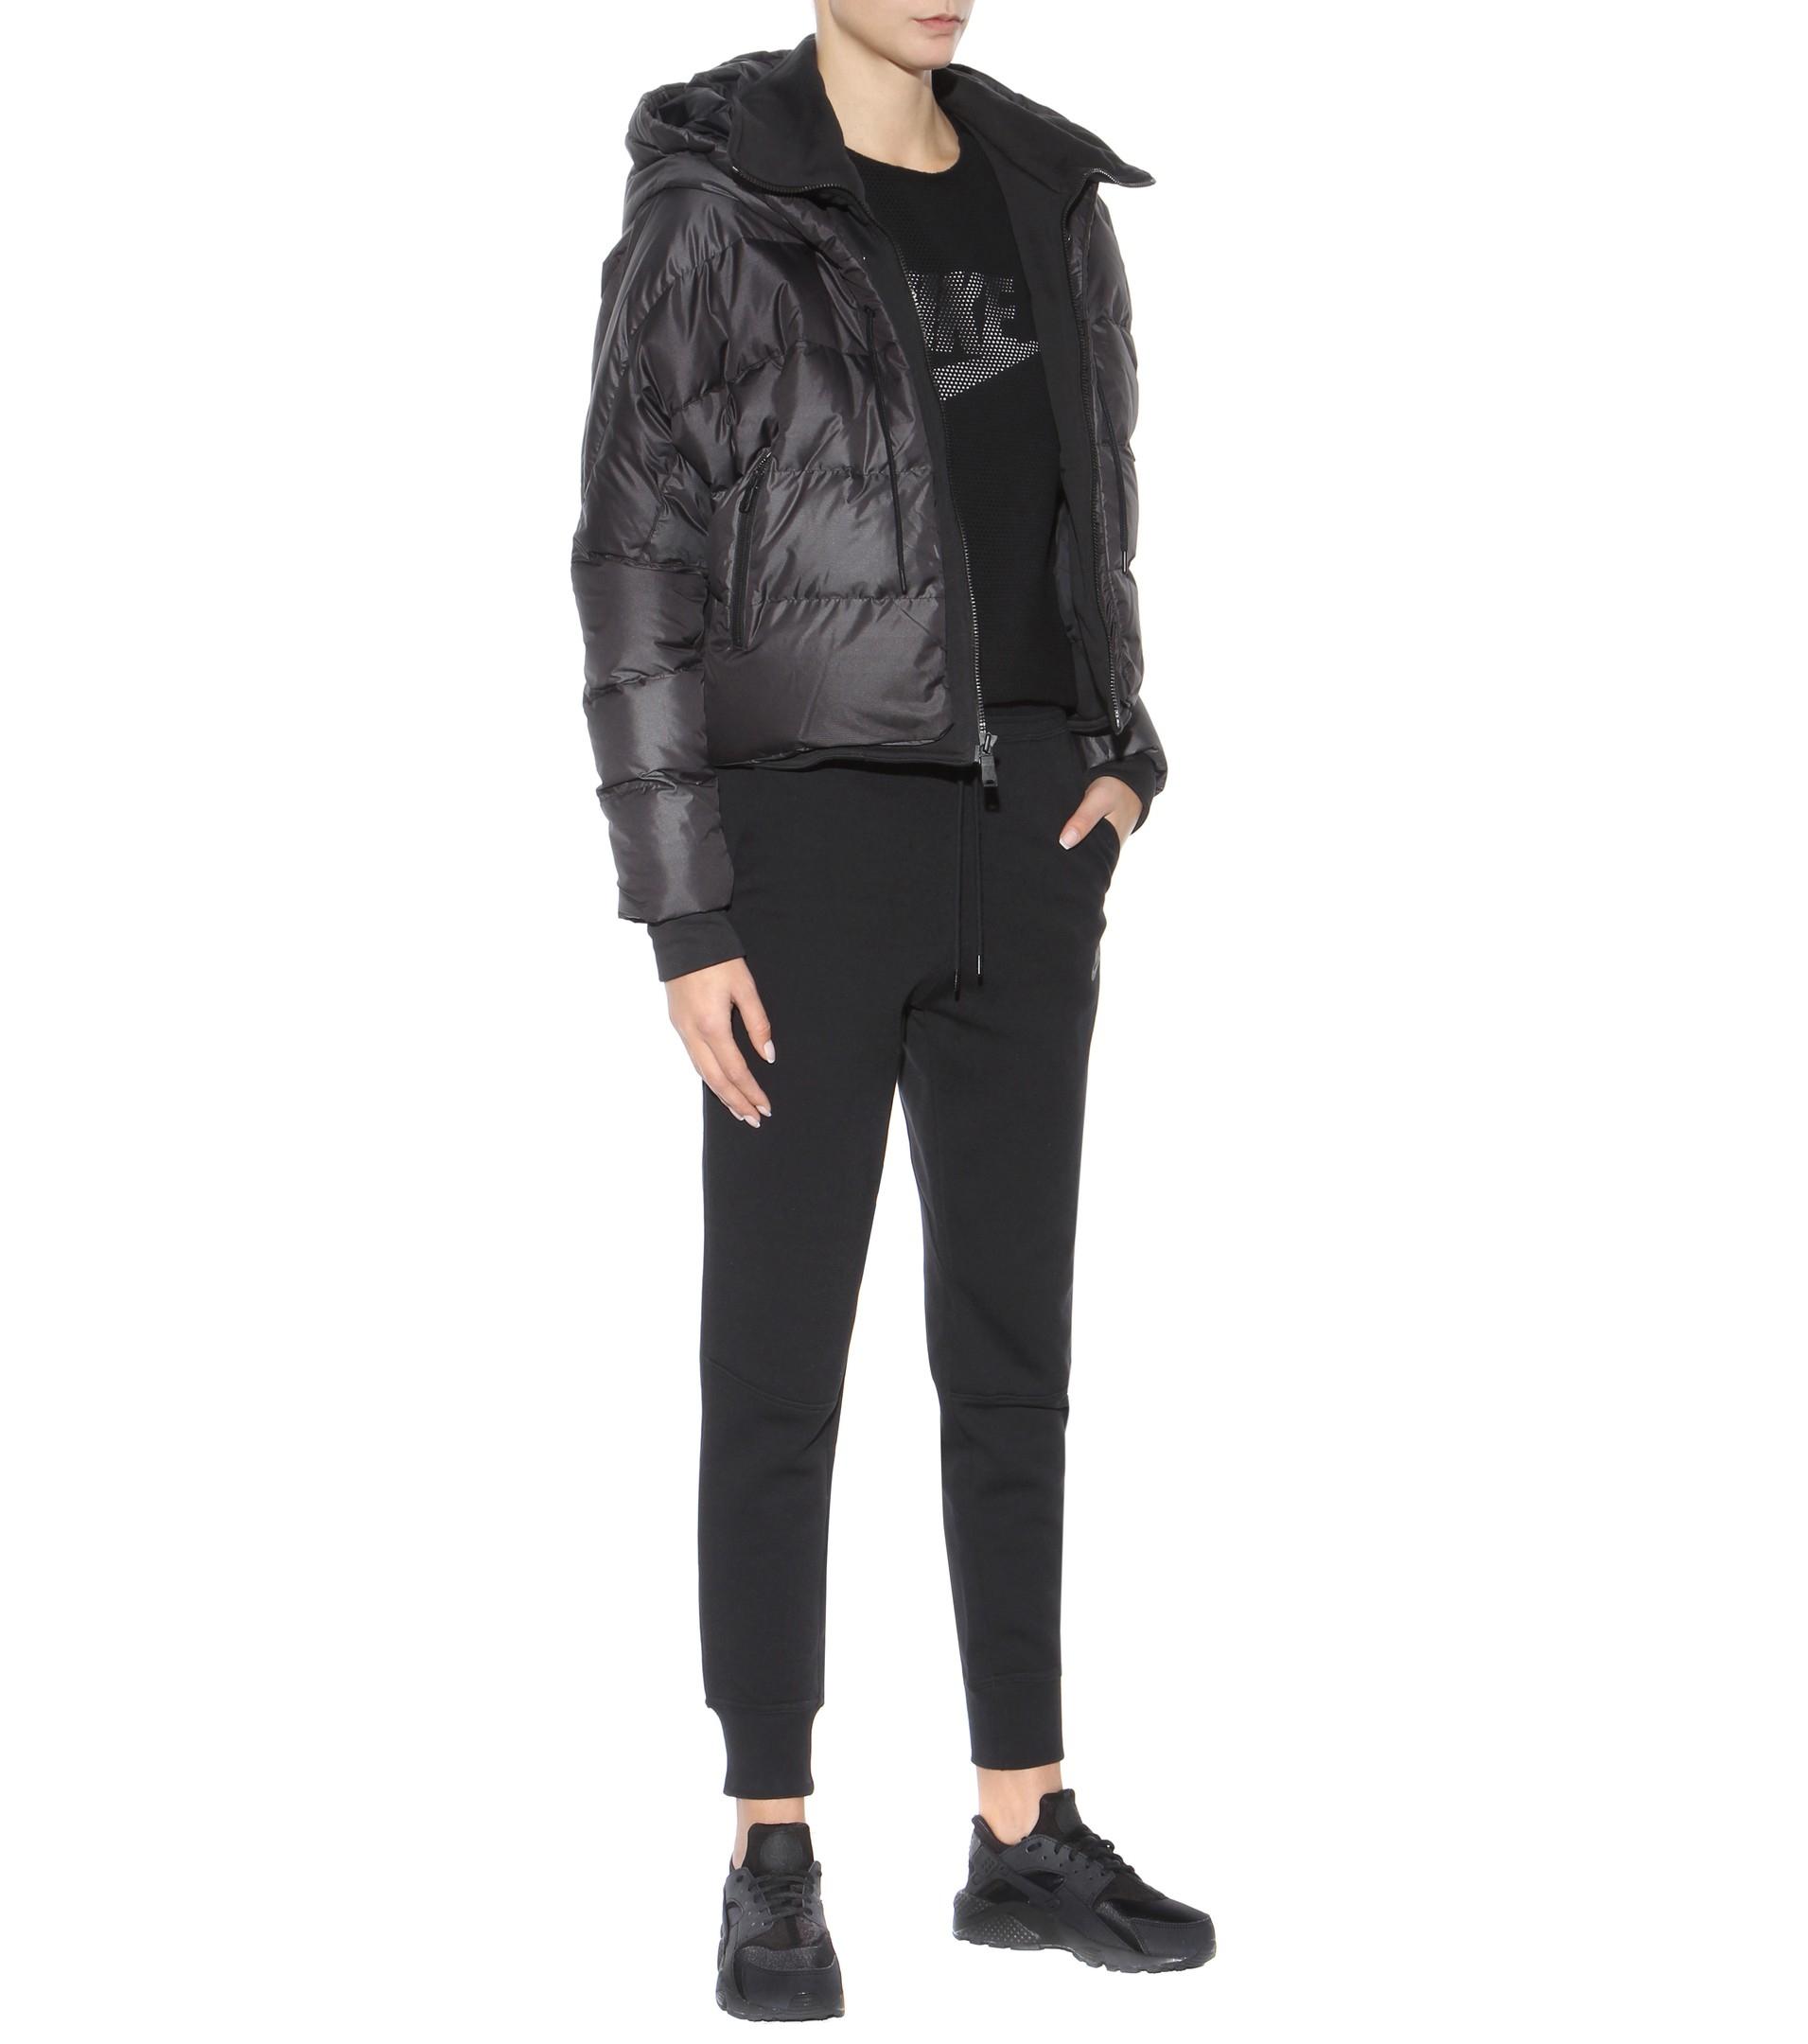 Nike Uptown 550 Down Jacket In Black Lyst